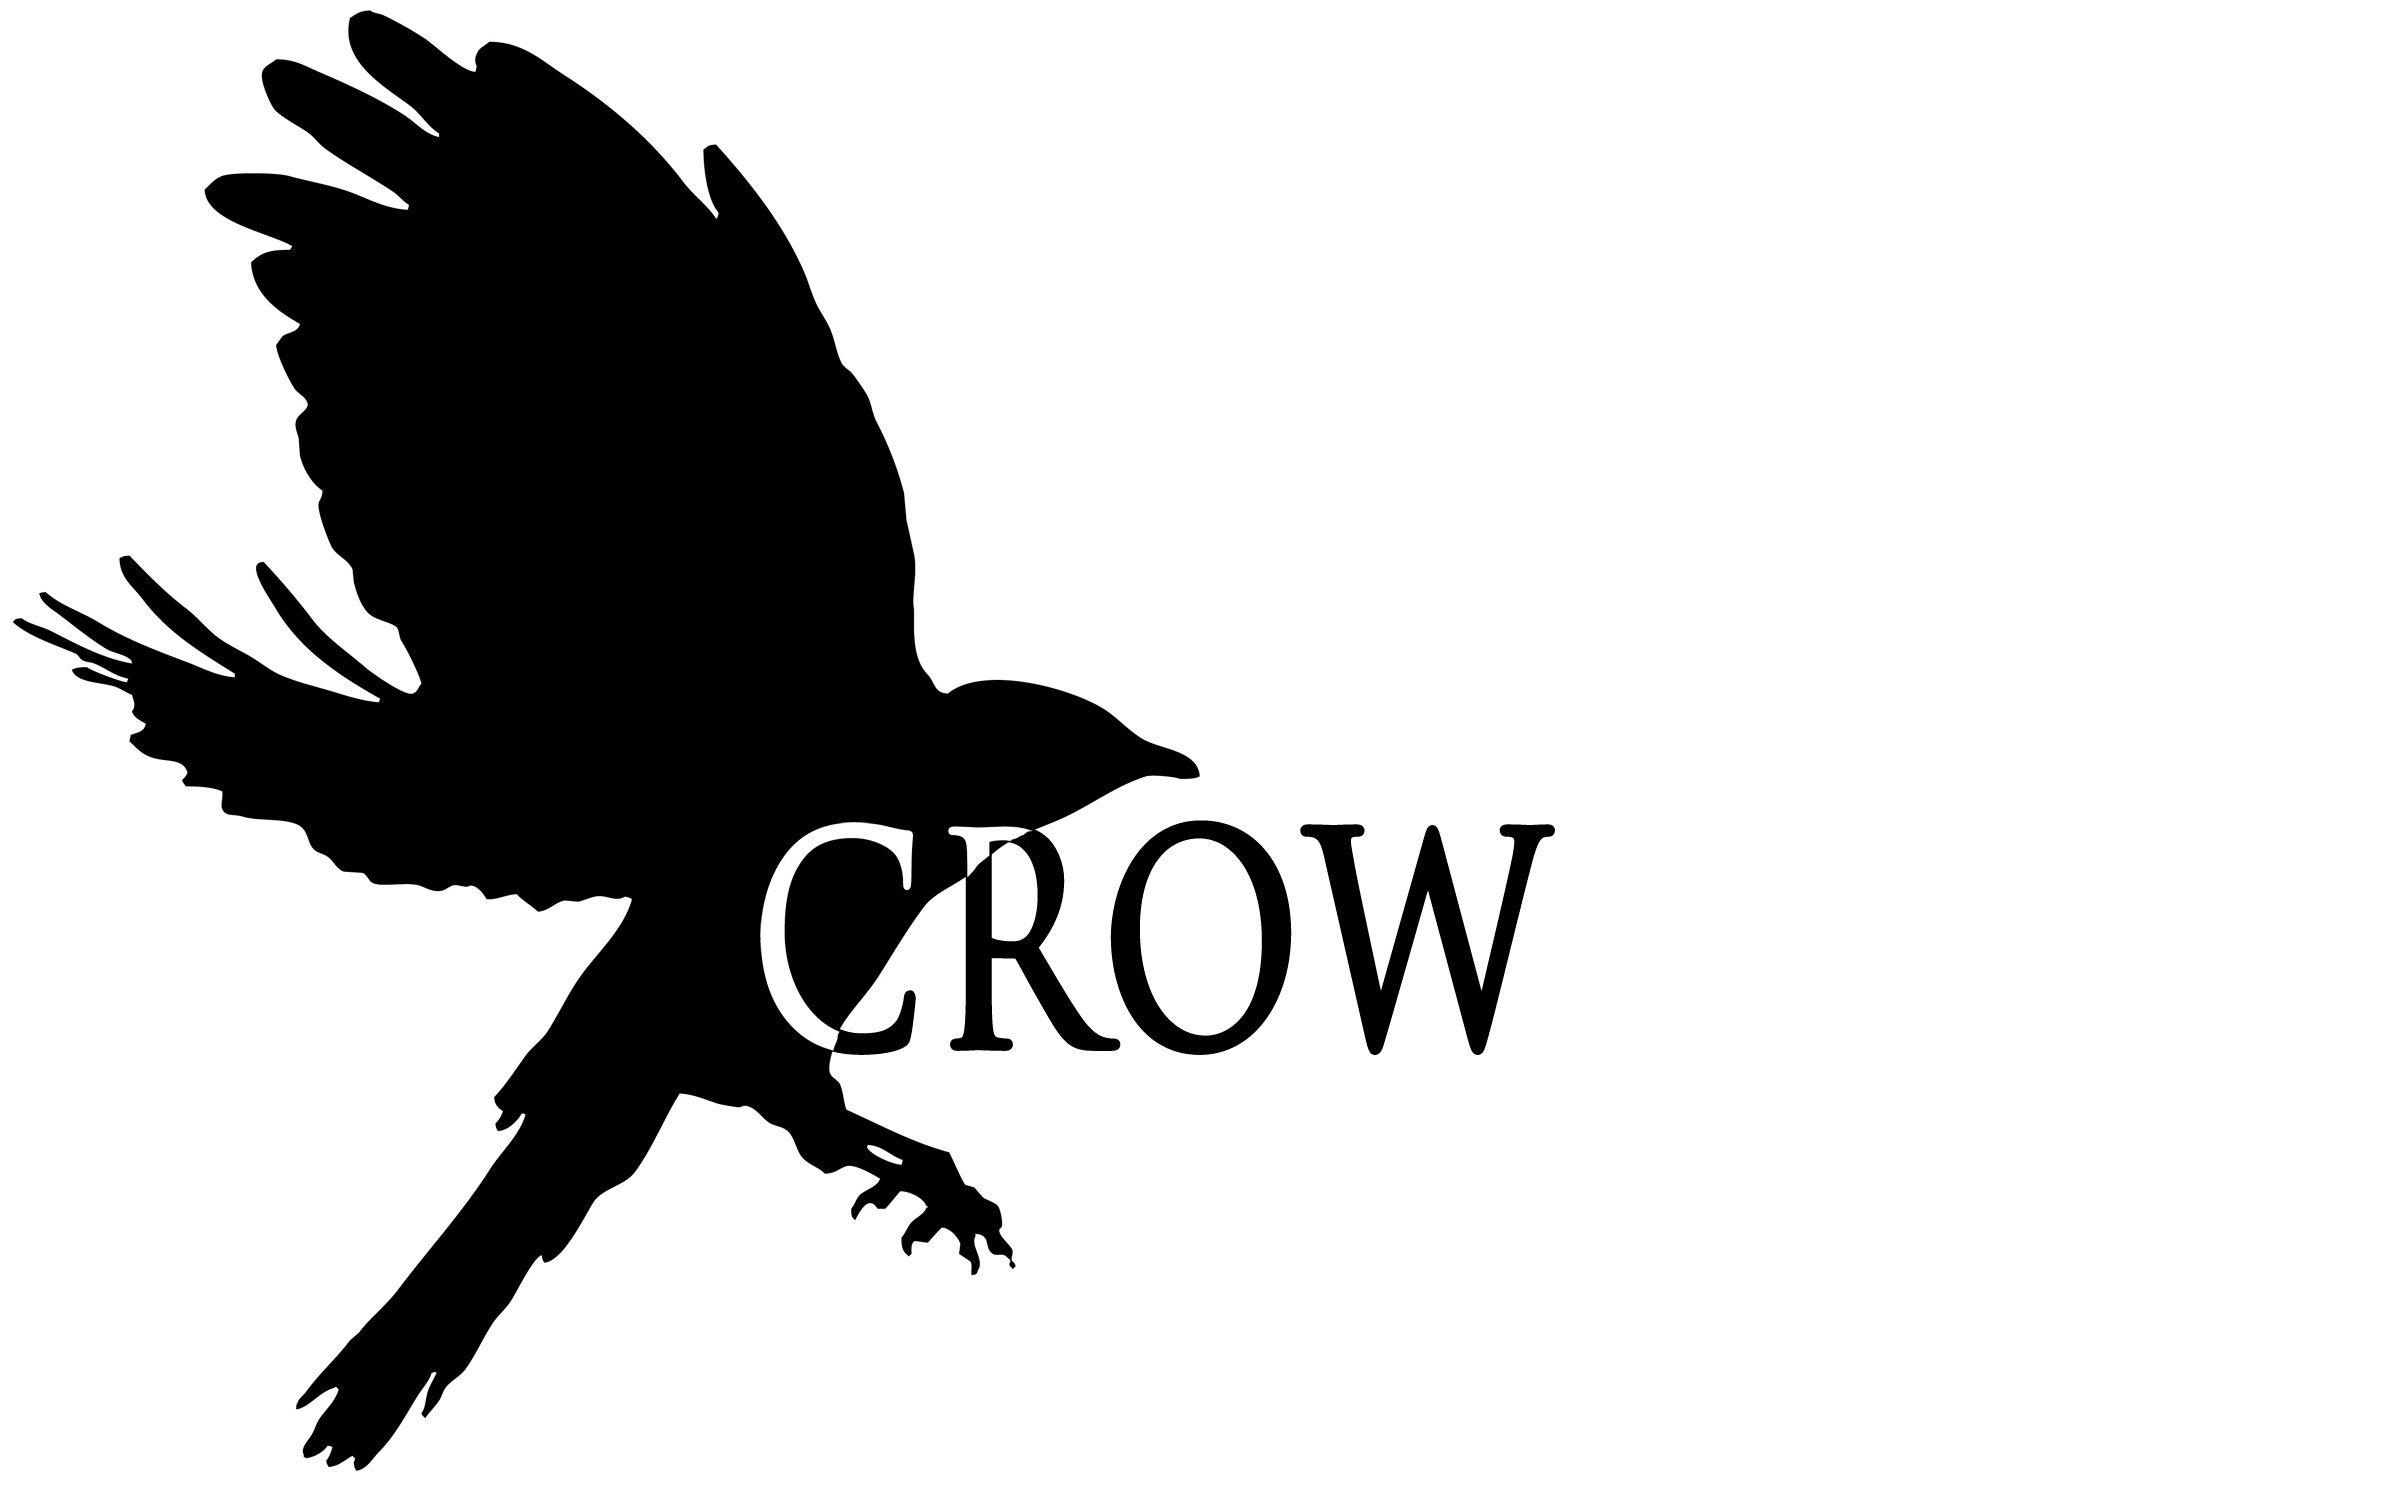 crow logo logo pinterest crows and logos rh pinterest com ravens logos free raven logistics careers